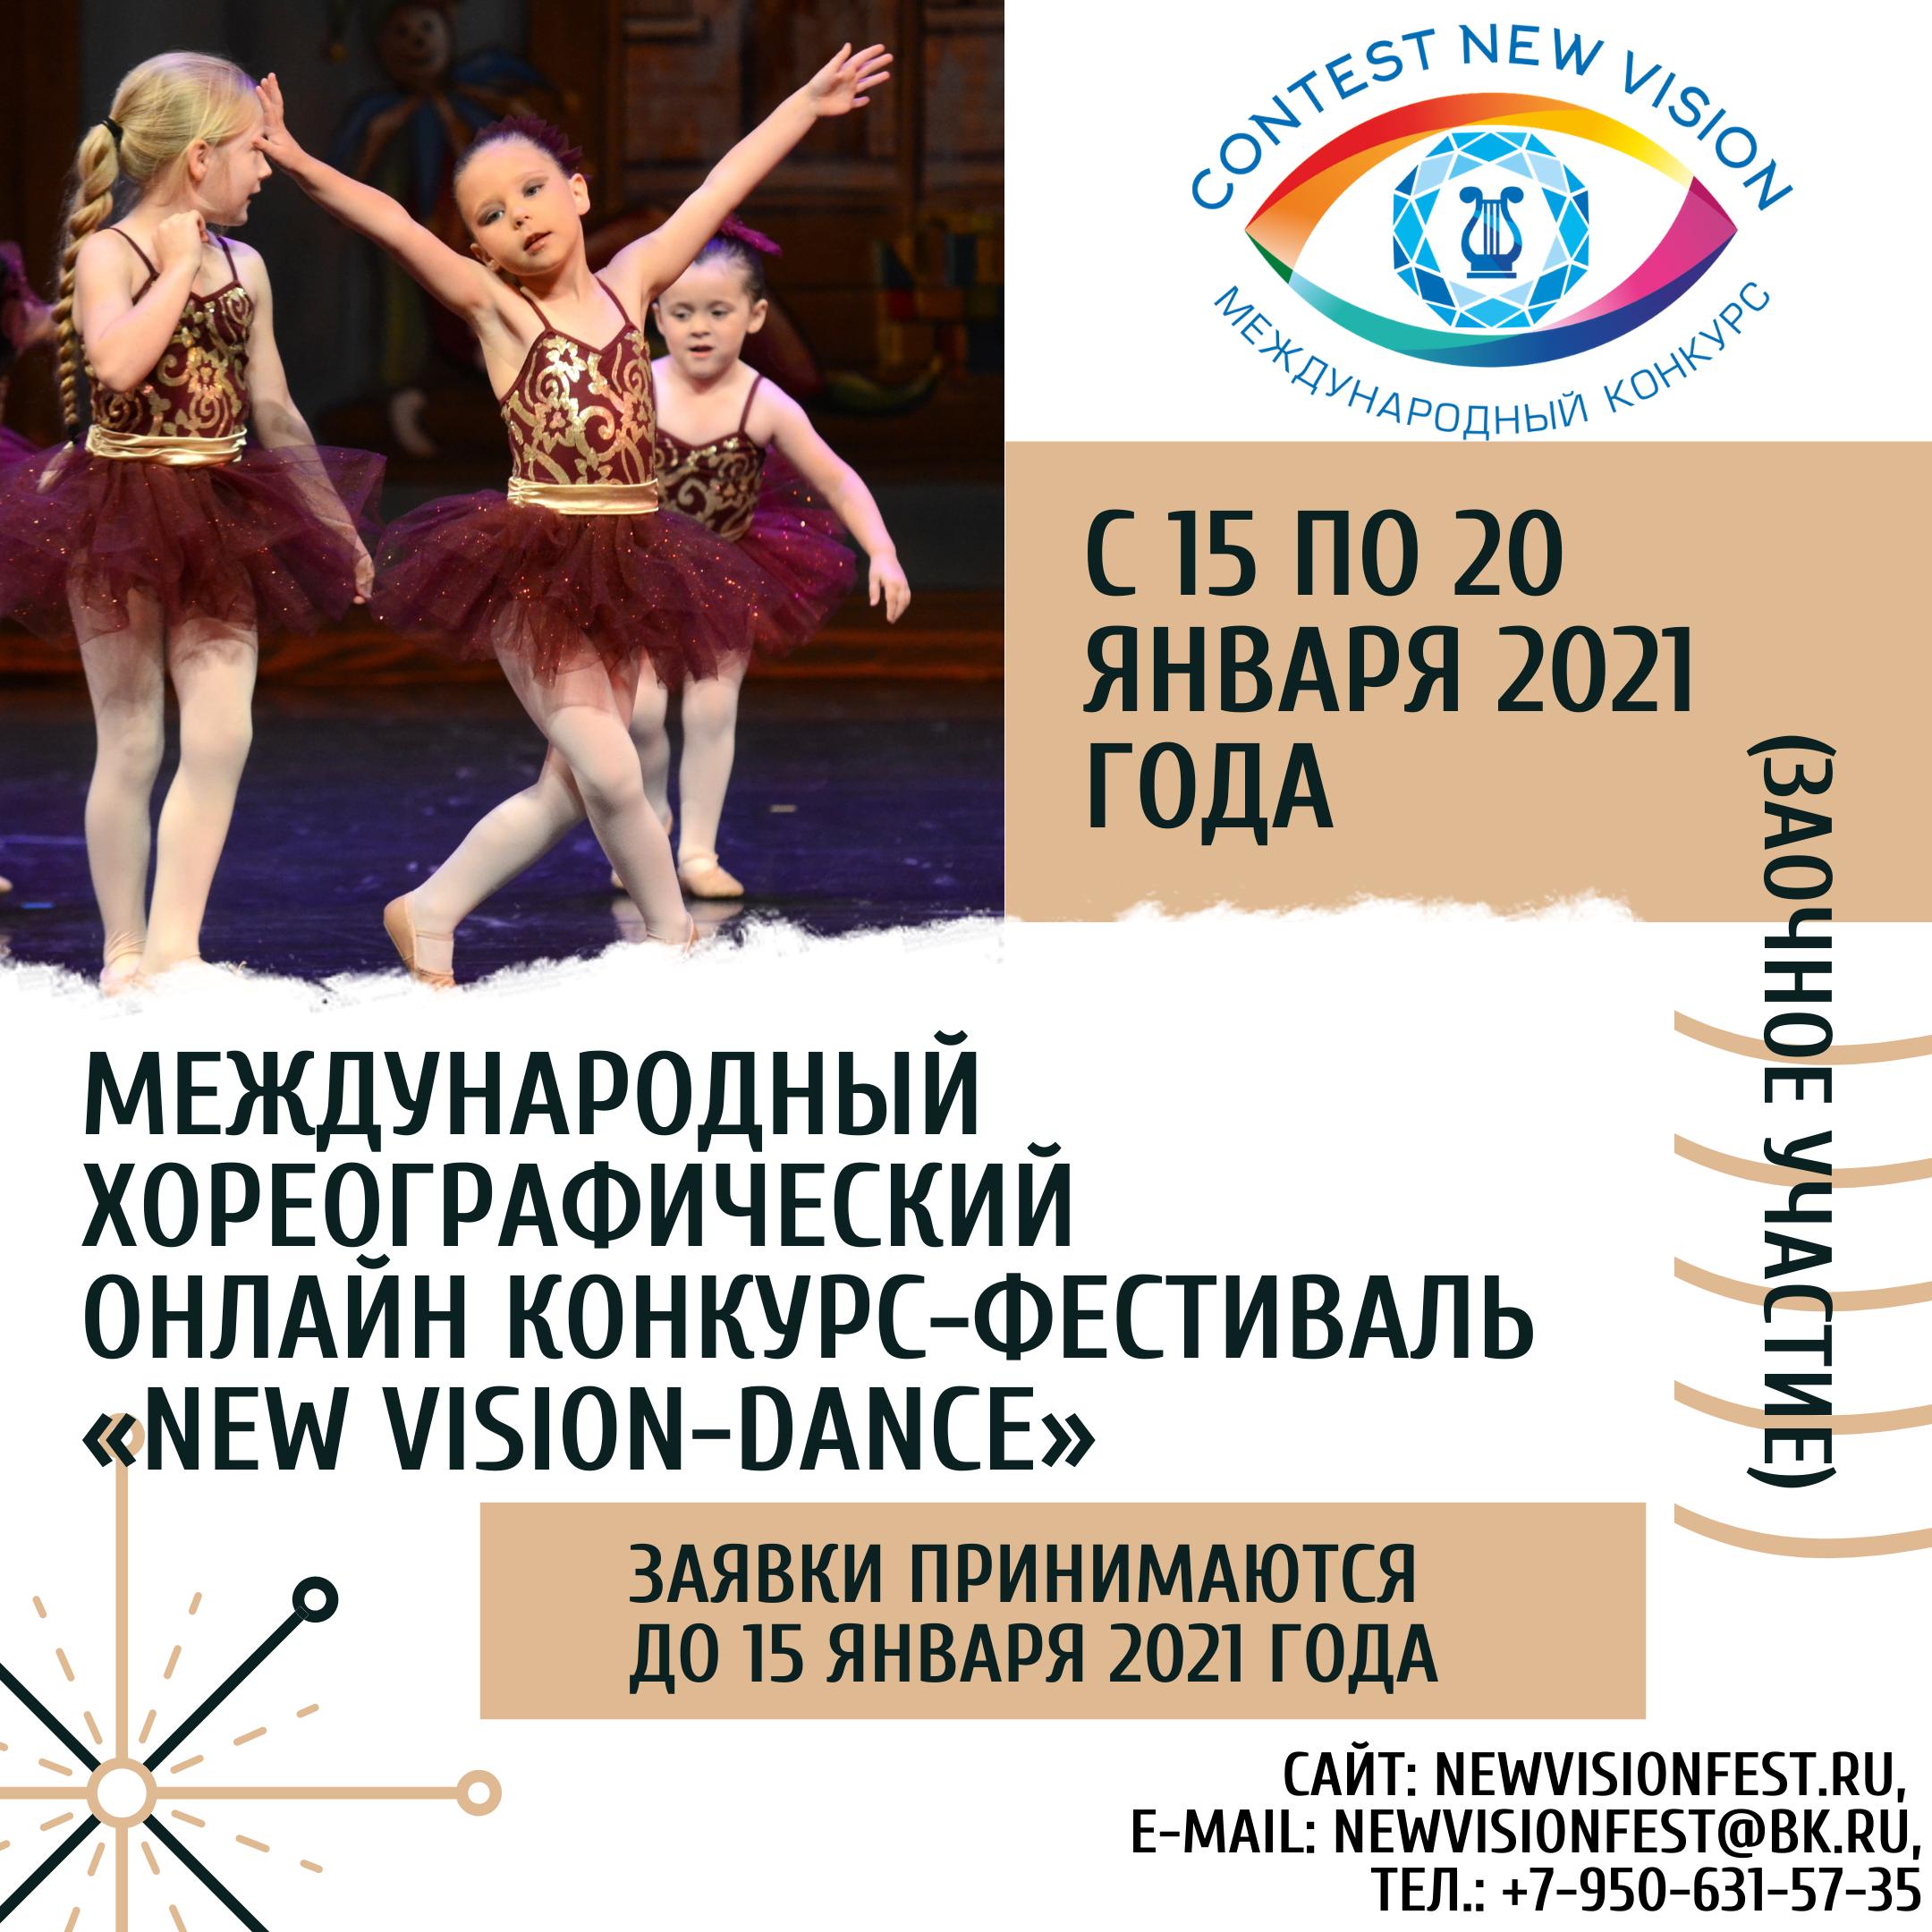 NEW VISION - DANCE